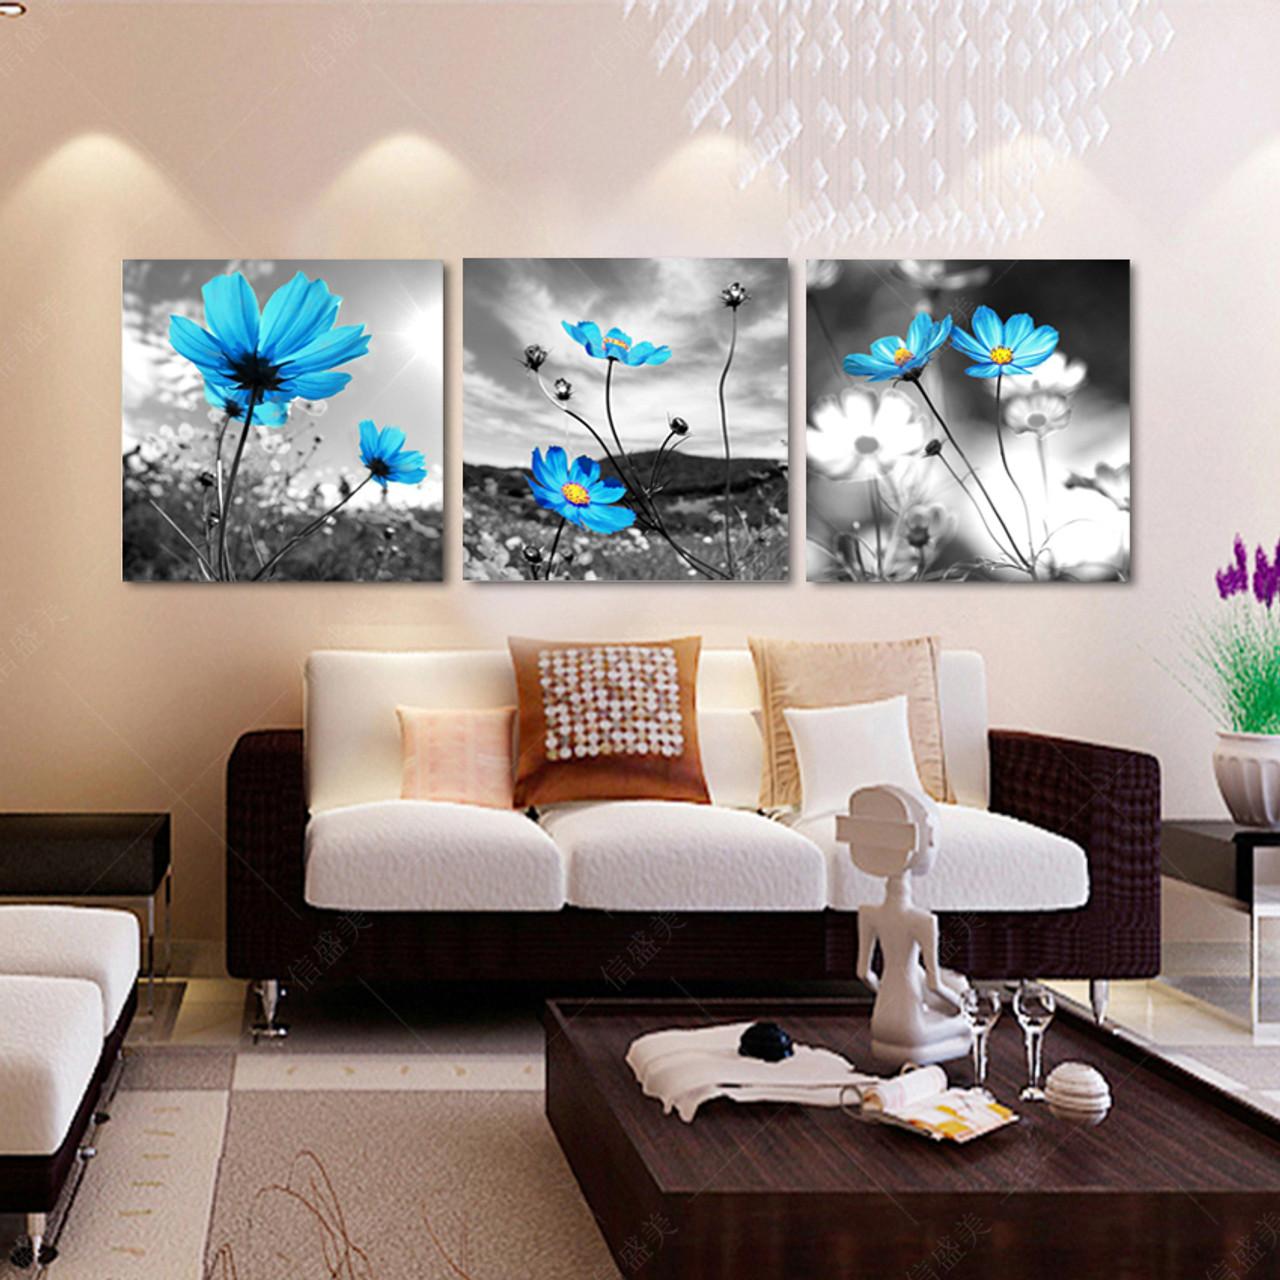 3 Piece Hd Print Canvas Modern Schilderij Flowers Oil Paintings ...